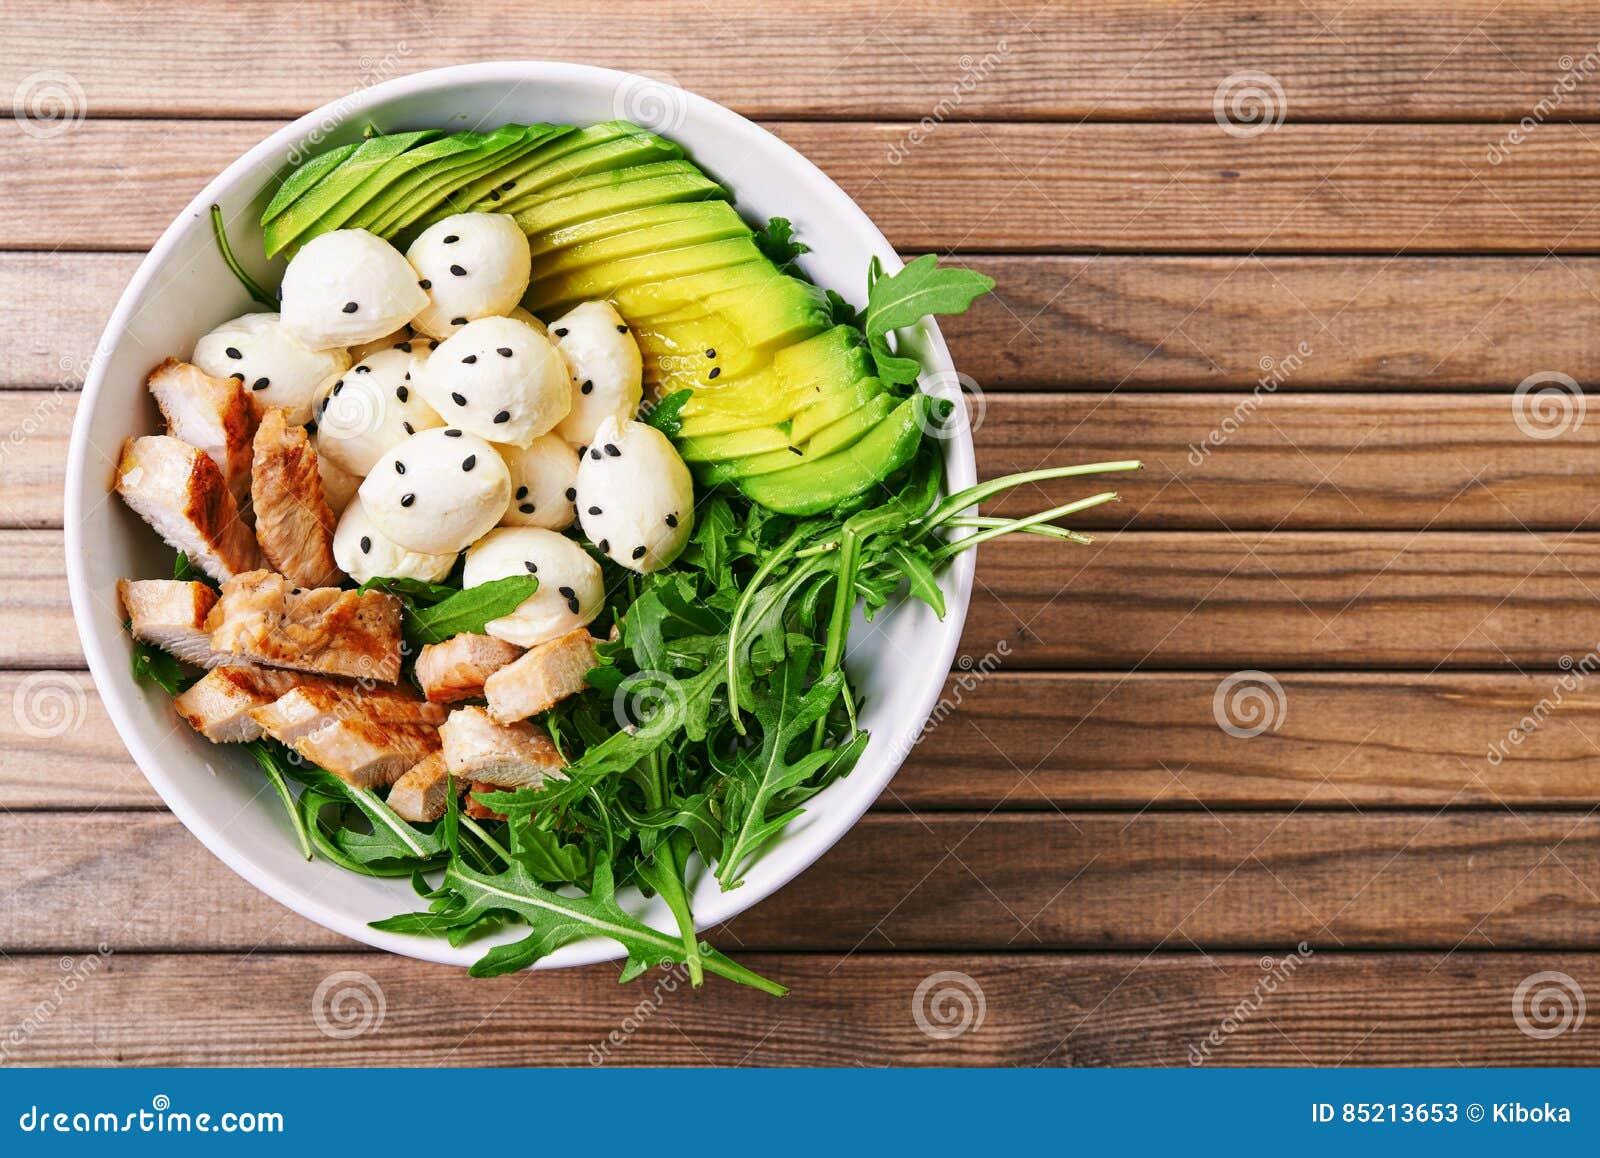 Salad with turkey